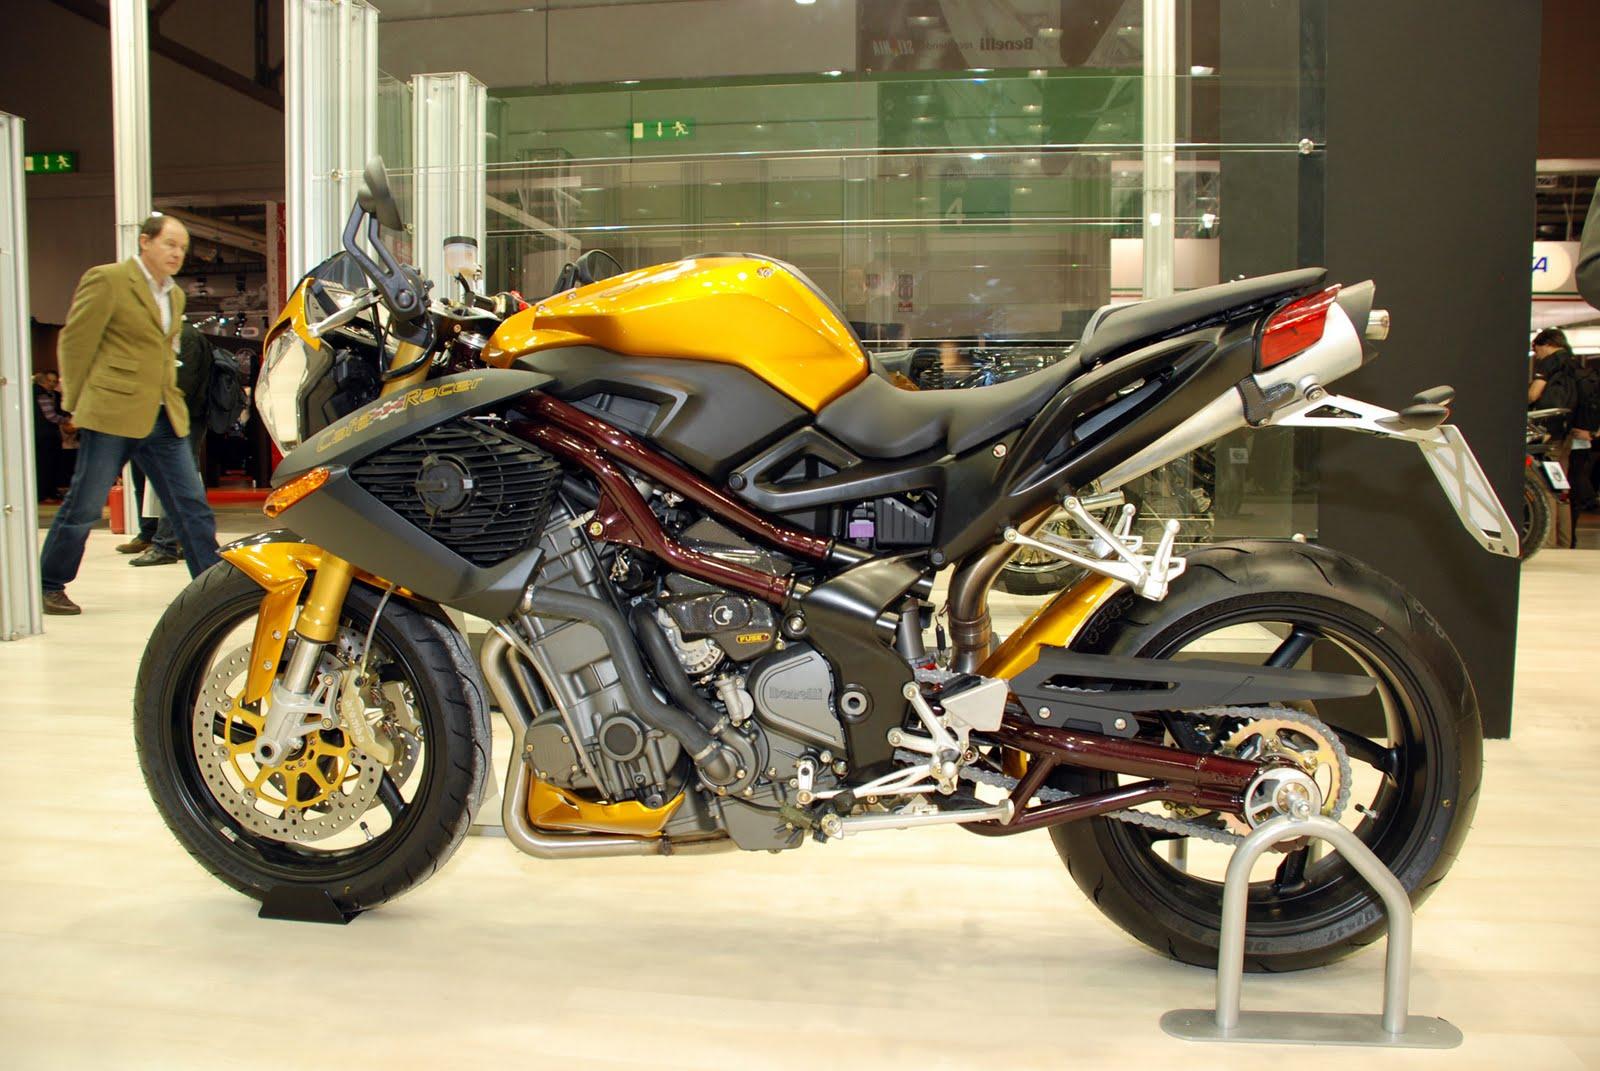 http://1.bp.blogspot.com/_1d1OMhUPzz8/S-ERspsjRnI/AAAAAAAADxY/SGqVe5tC9HE/s1600/2010-benelli-tnt-899-cafe-racer-eicma-6.jpg